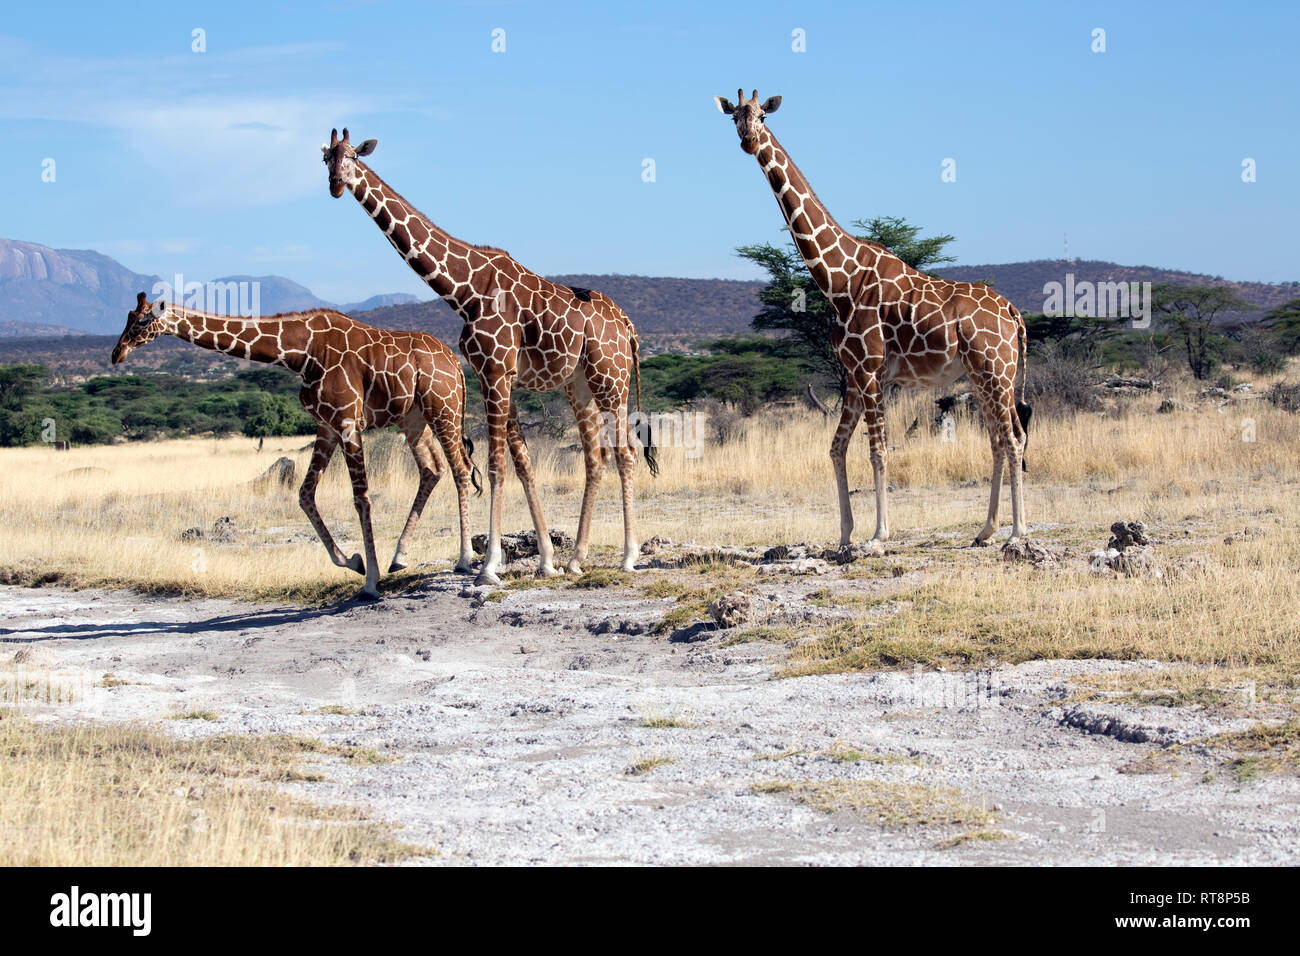 Trois somaliens ou réticulée, girafe Giraffa camelopardalis reticulata, dans des prairies semi-arides, Buffalo Springs National Reserve, Kenya Banque D'Images